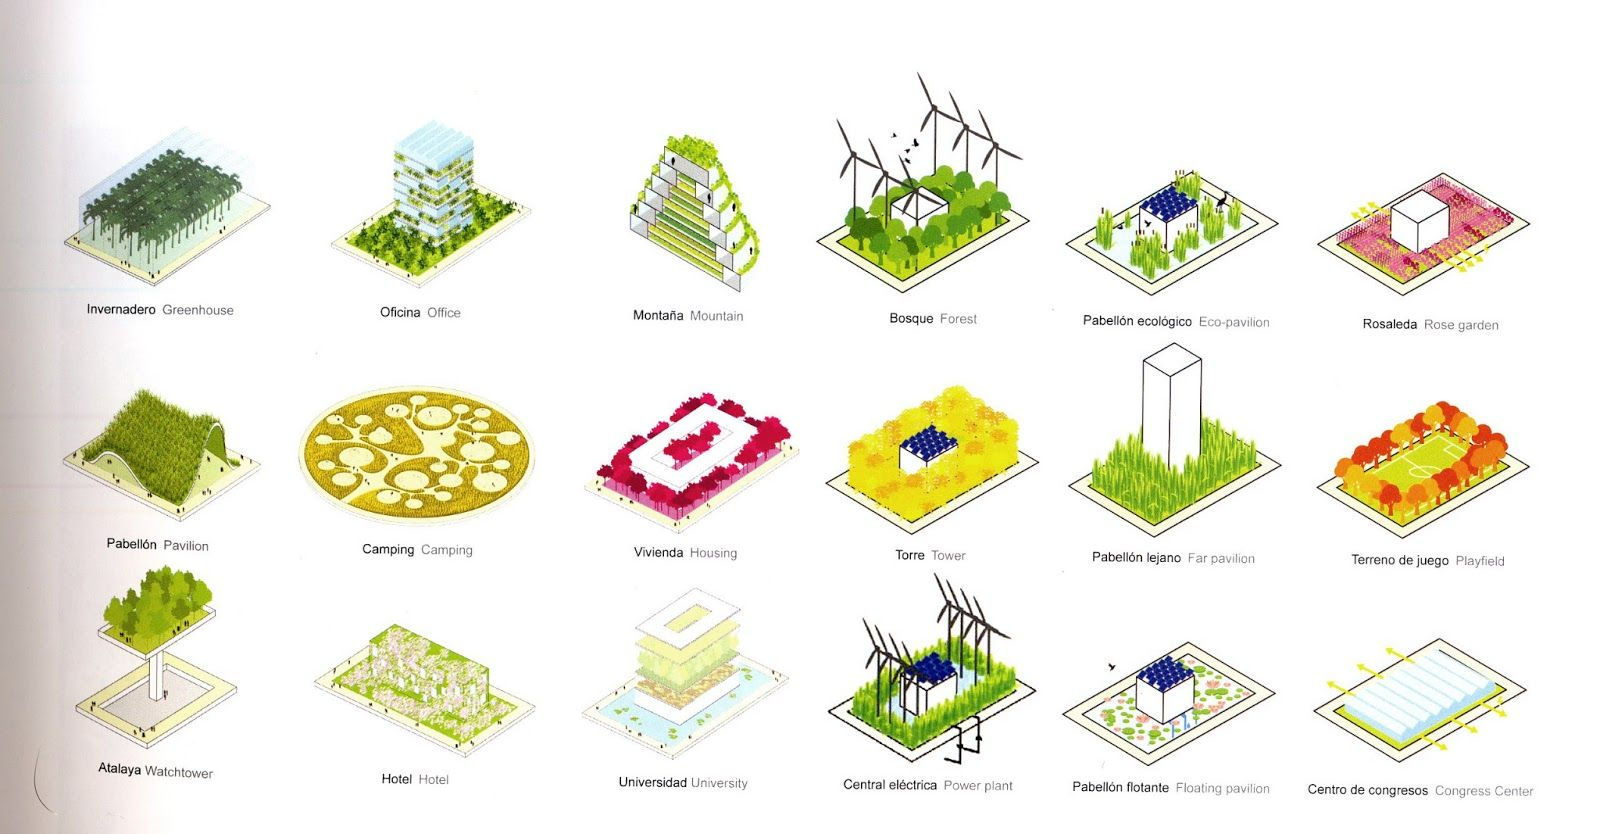 Mvrdvfloriade 2022 09 landscape urbanism pinterest diagram mvrdvfloriade 2022 malvernweather Choice Image